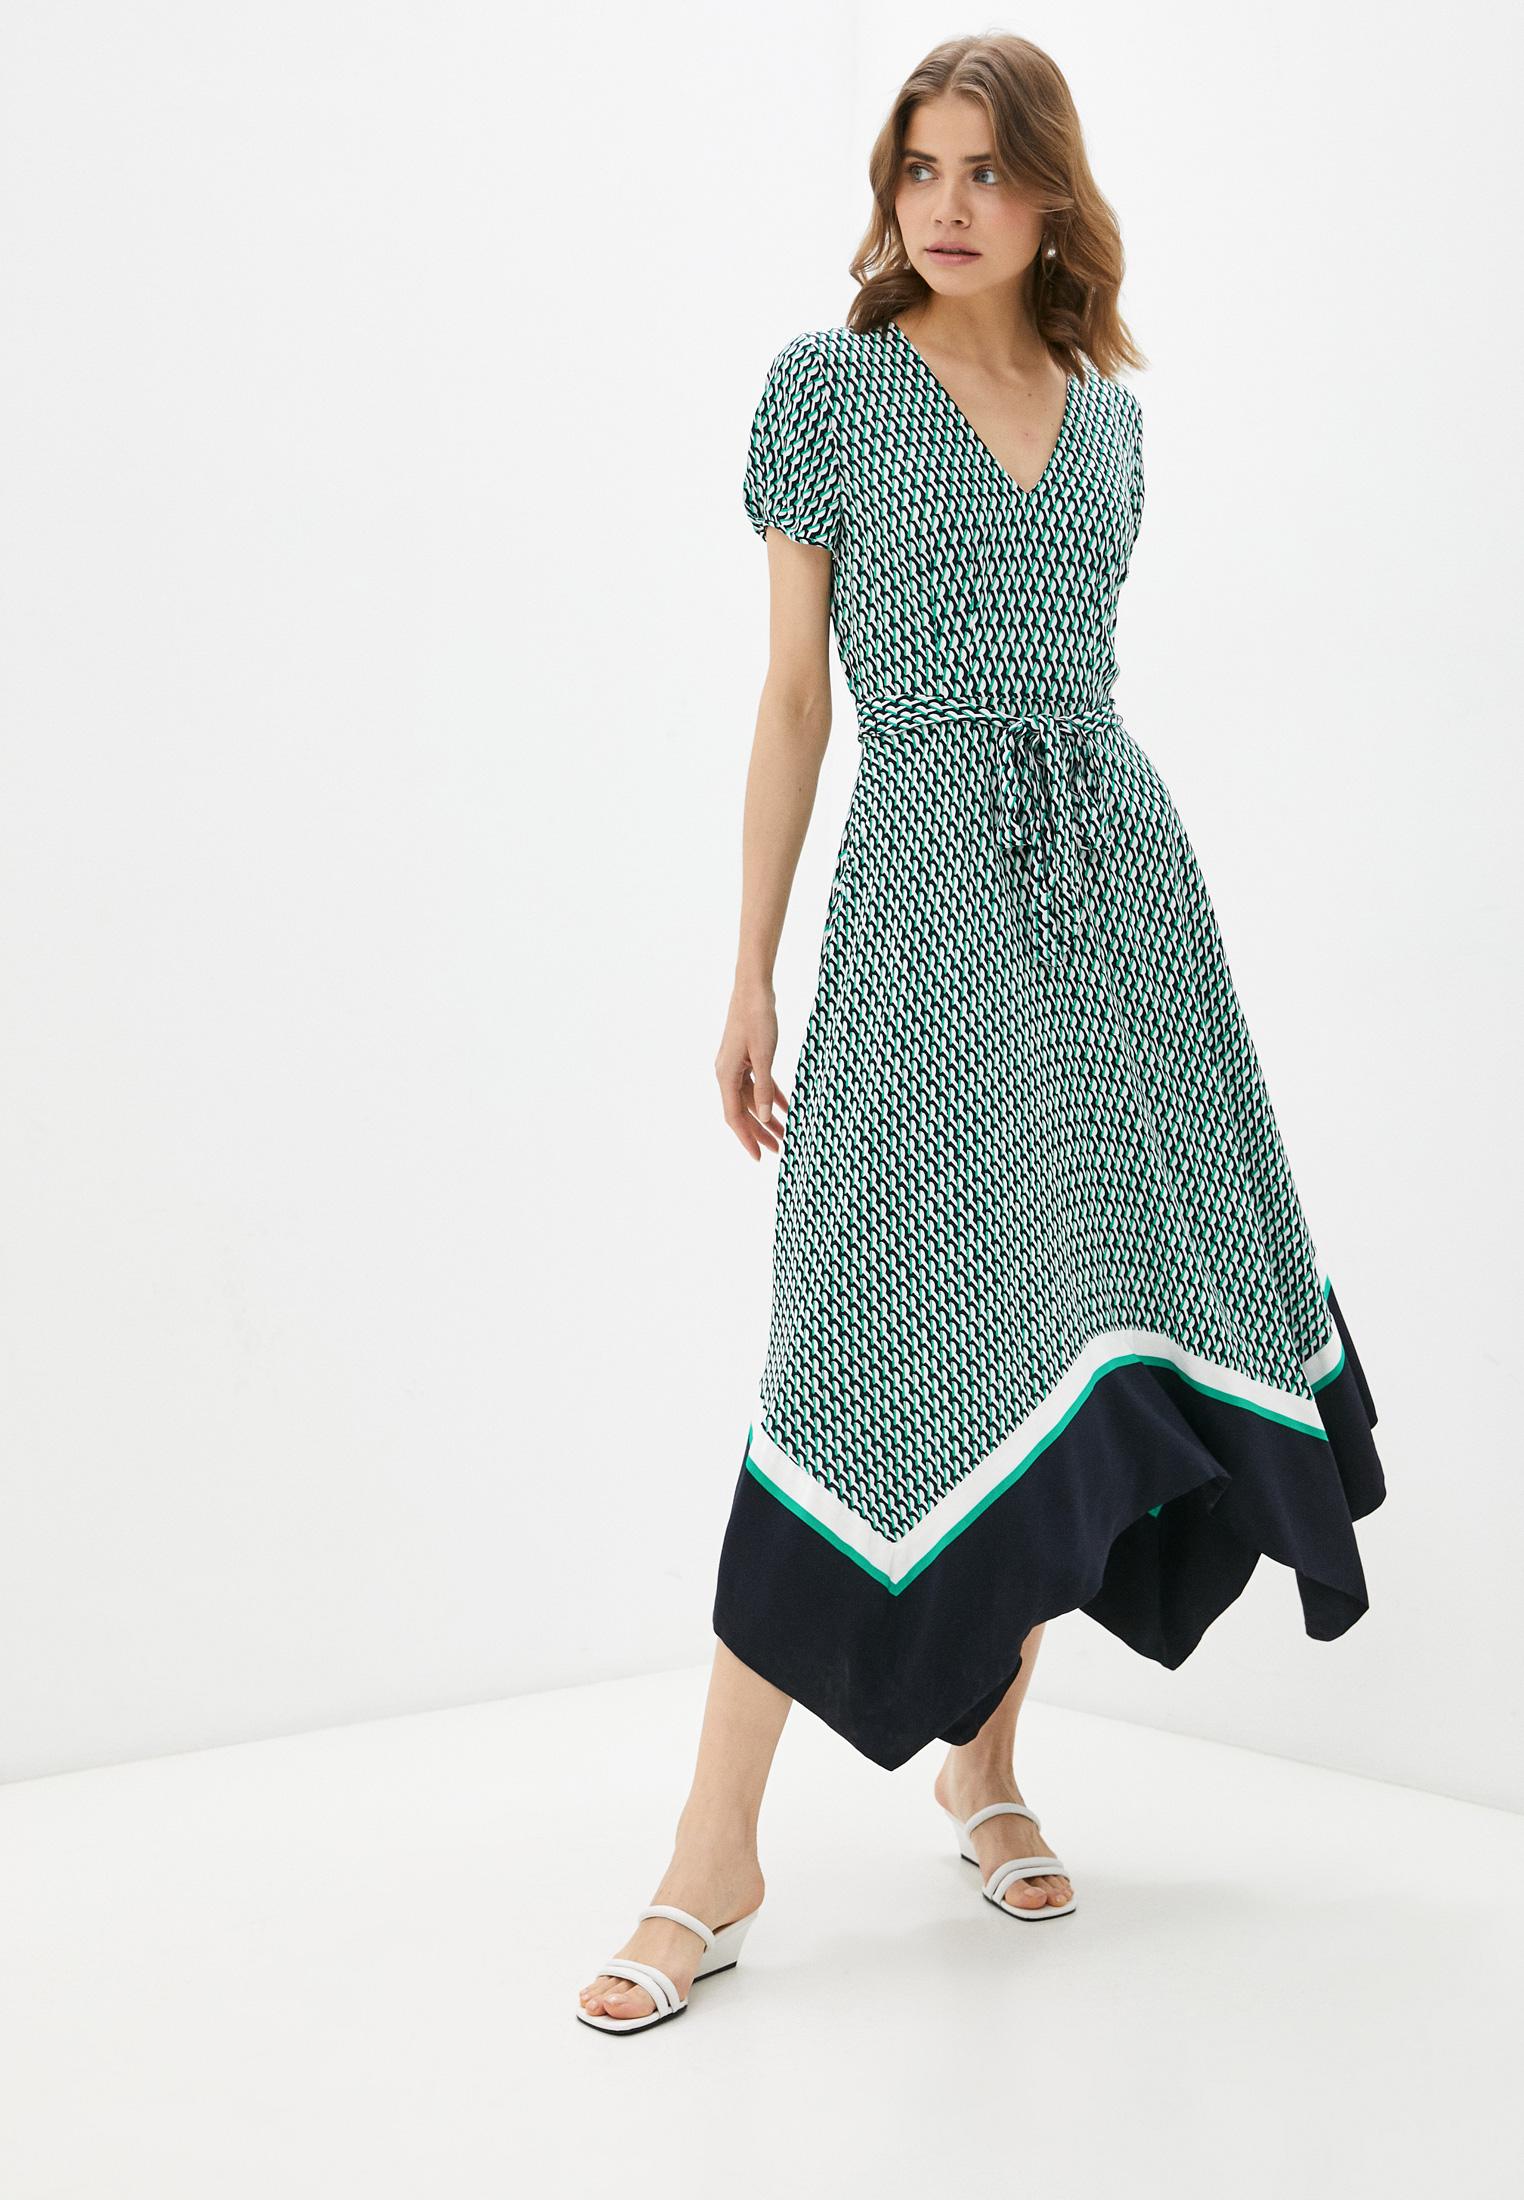 Платье Tommy Hilfiger (Томми Хилфигер) WW0WW30330: изображение 1